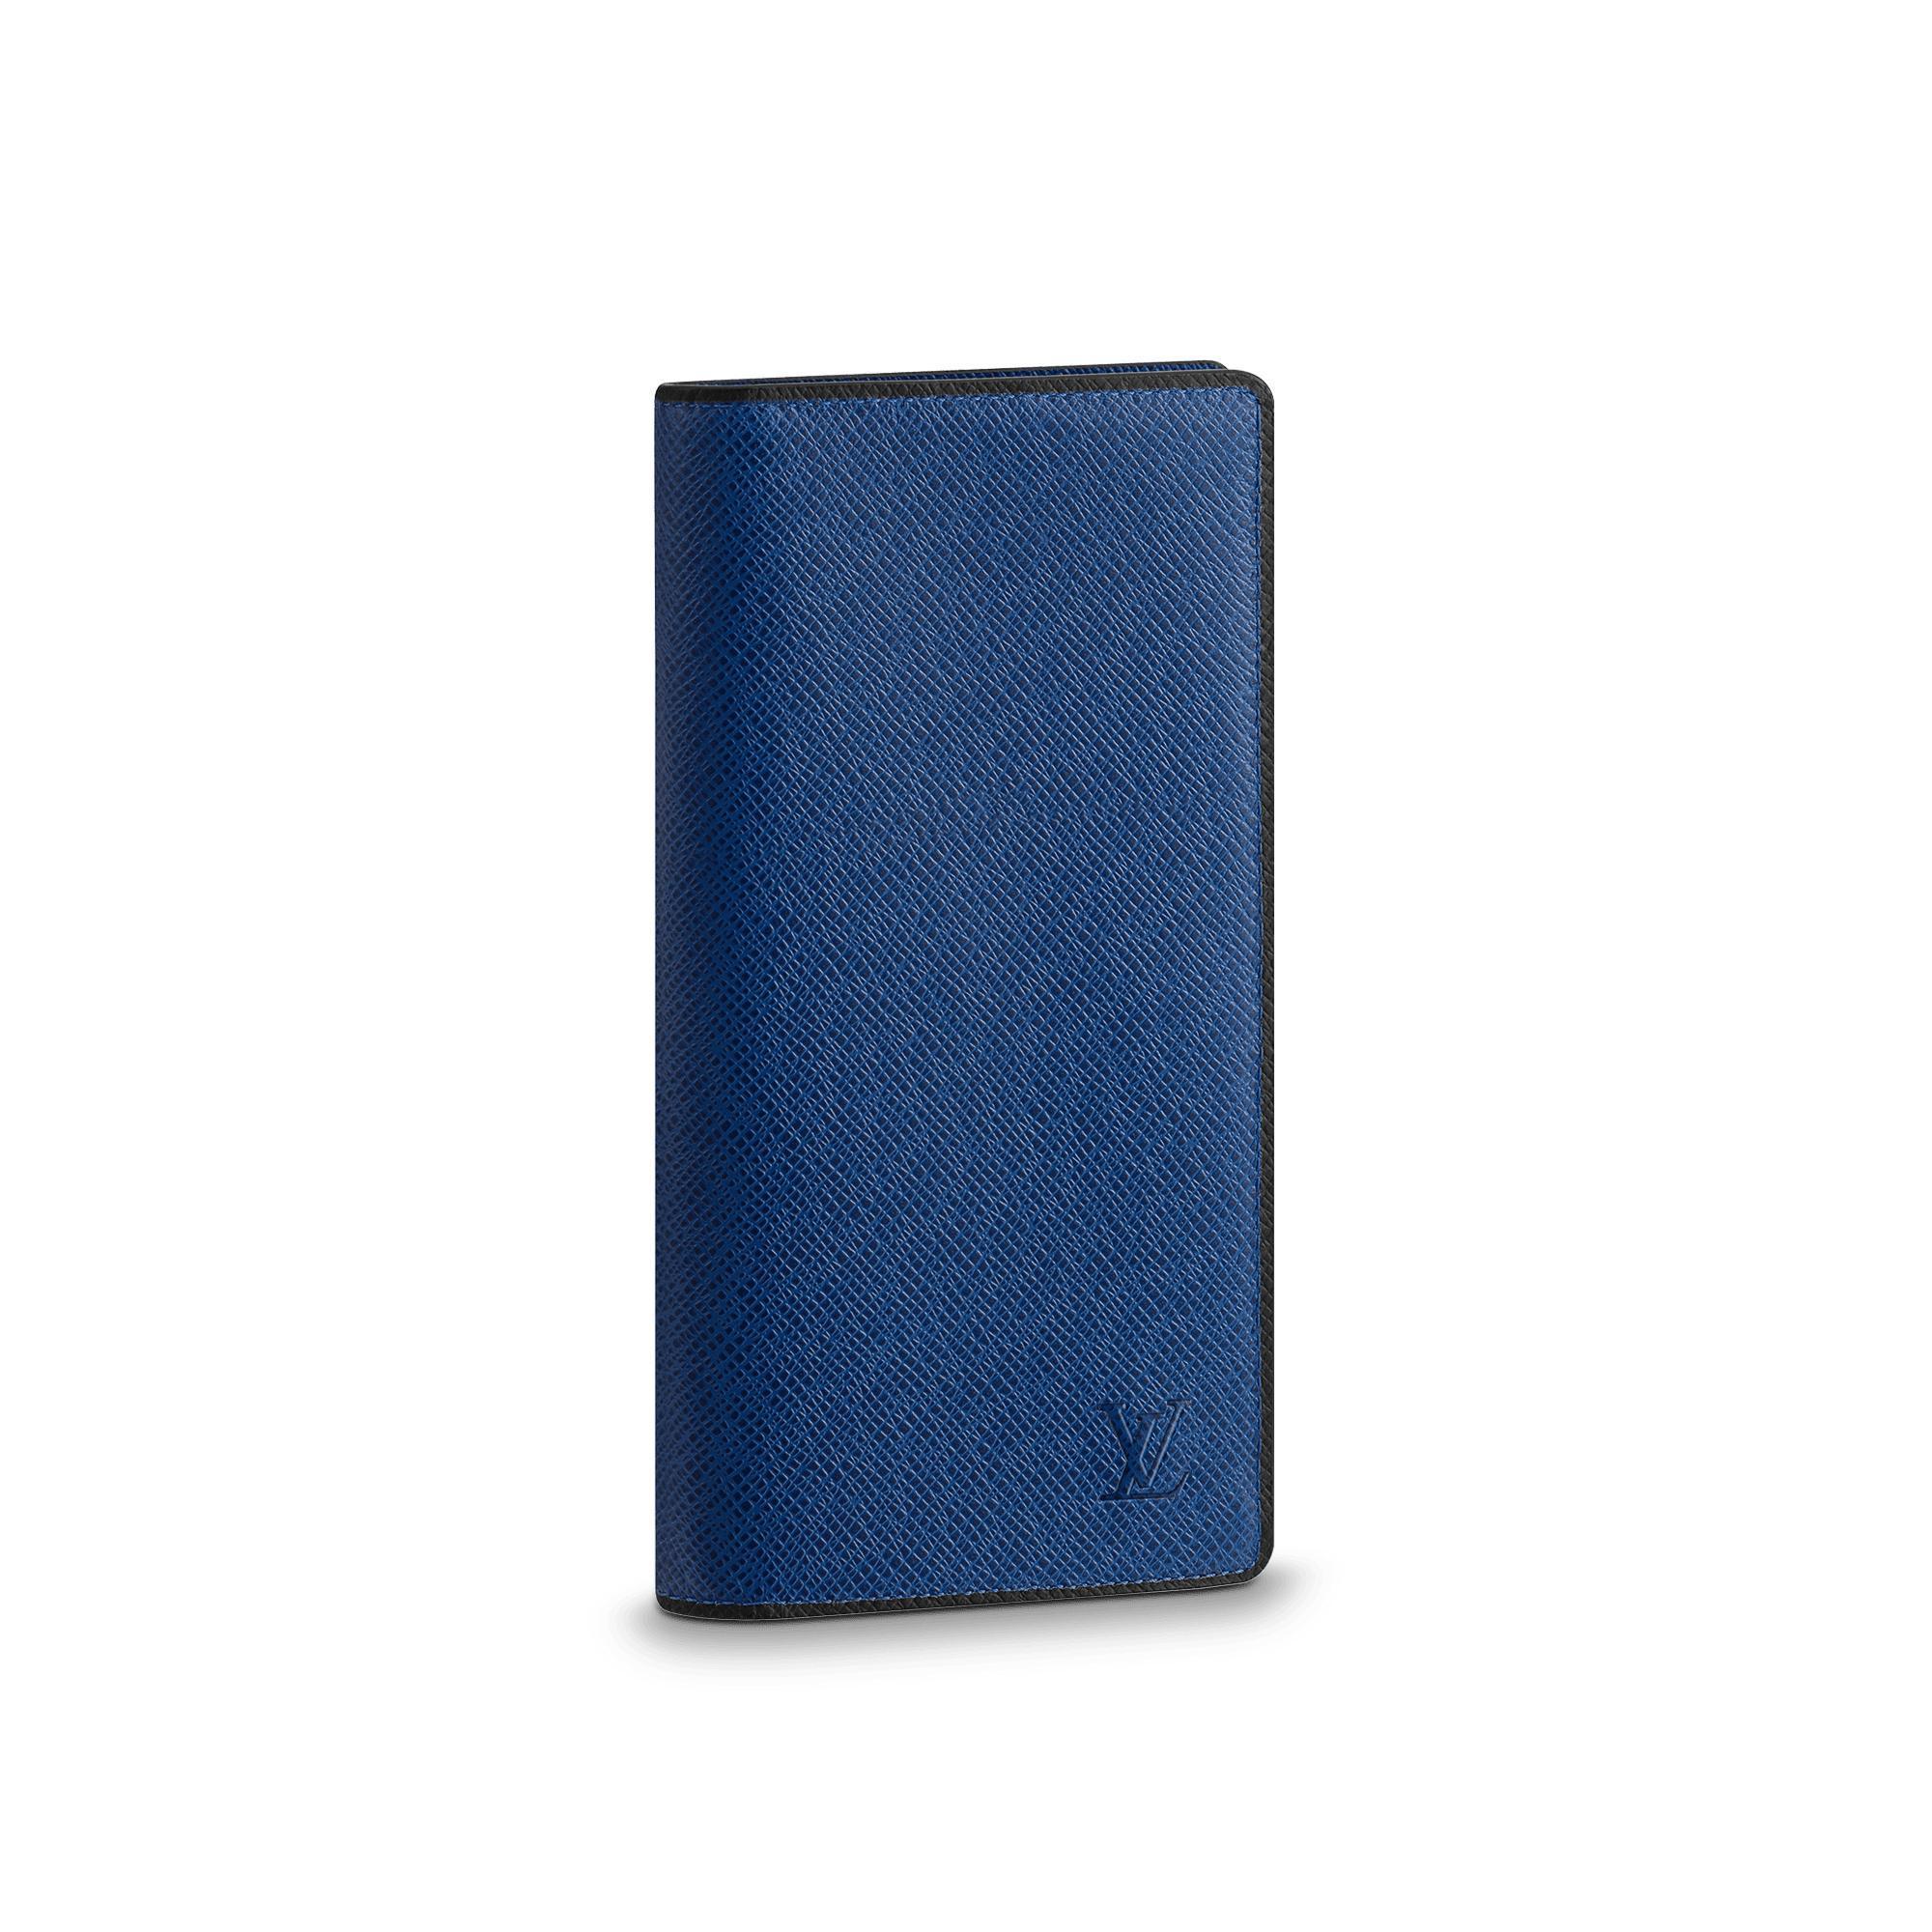 596511c7aba Brazza Wallet in Taiga Leather